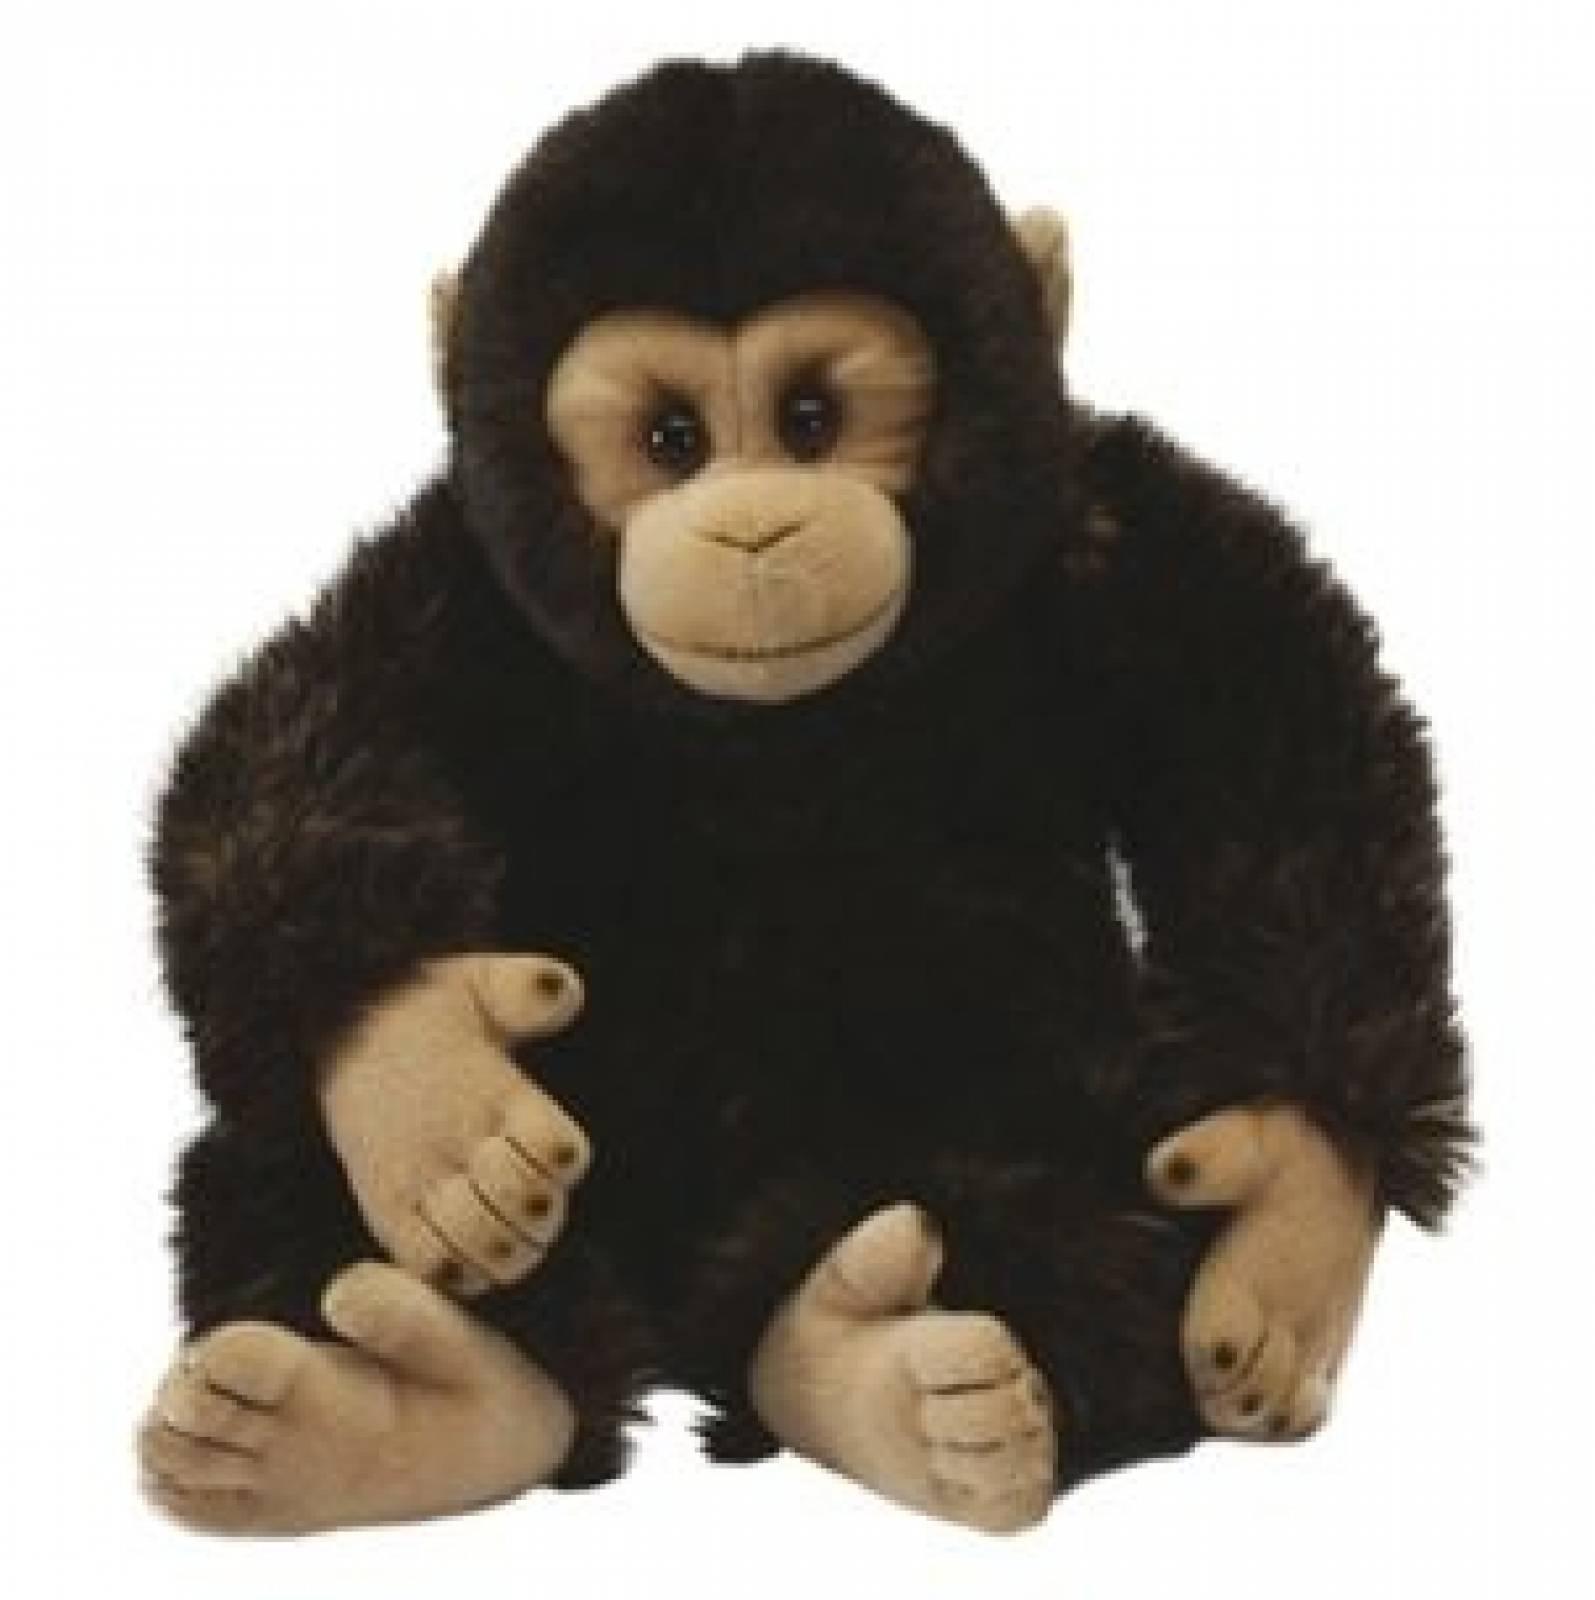 Chimp Soft Toy 30cm. 0+yrs